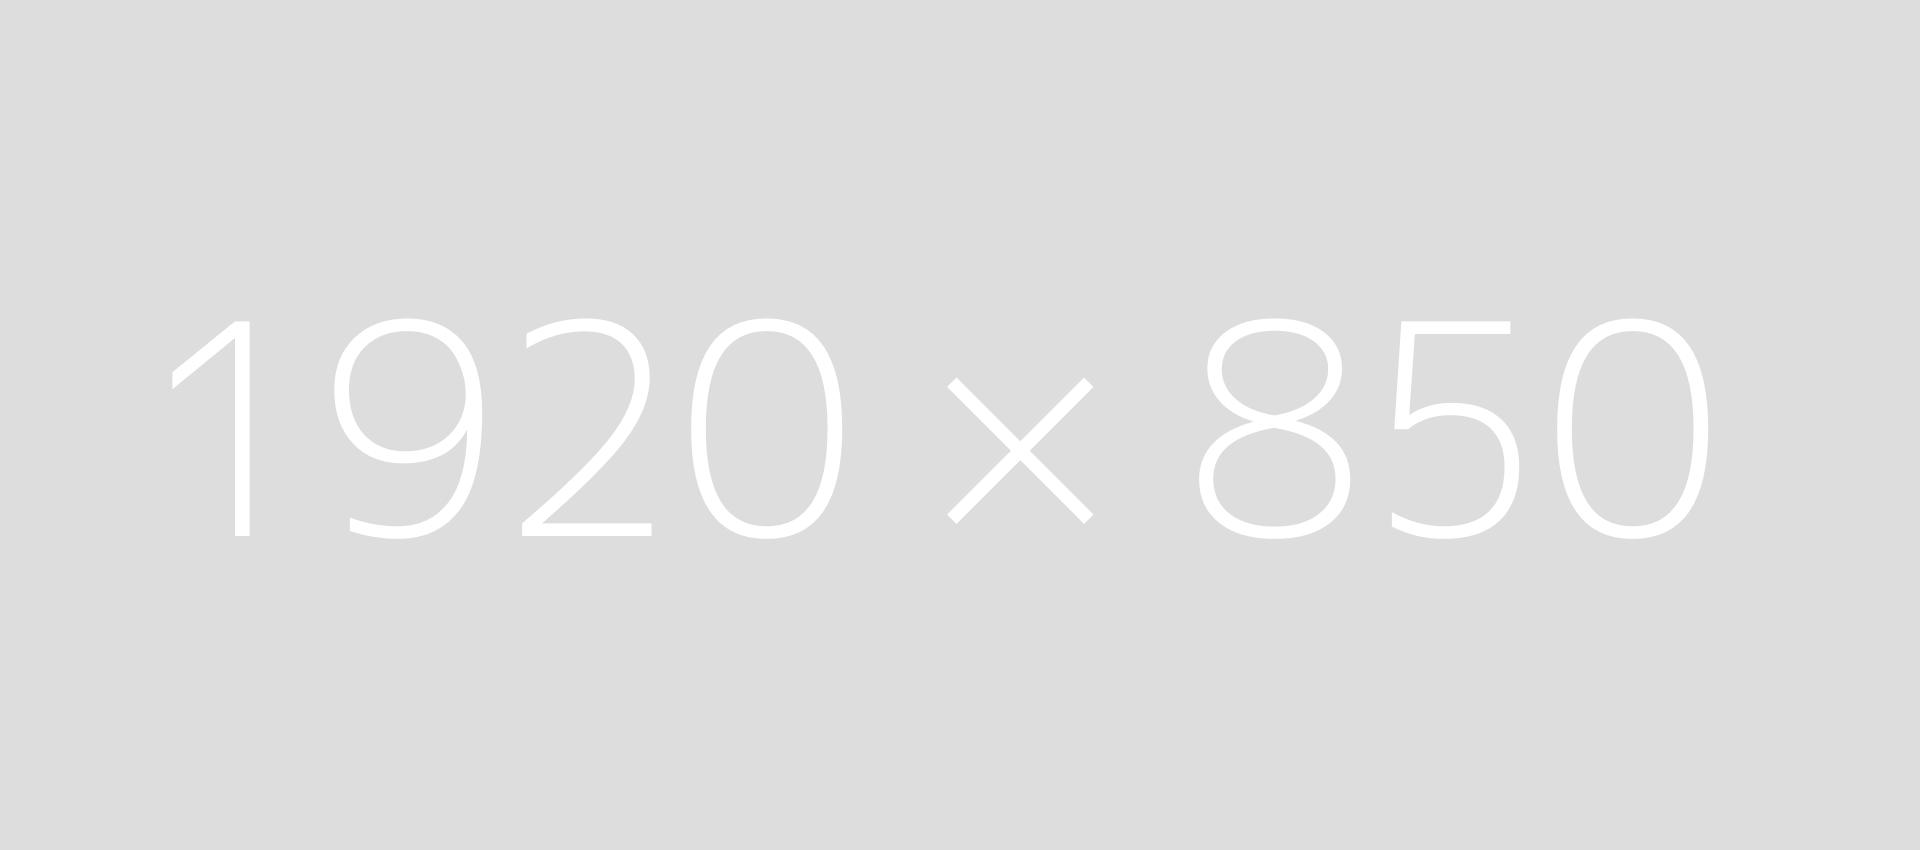 1920850dummy